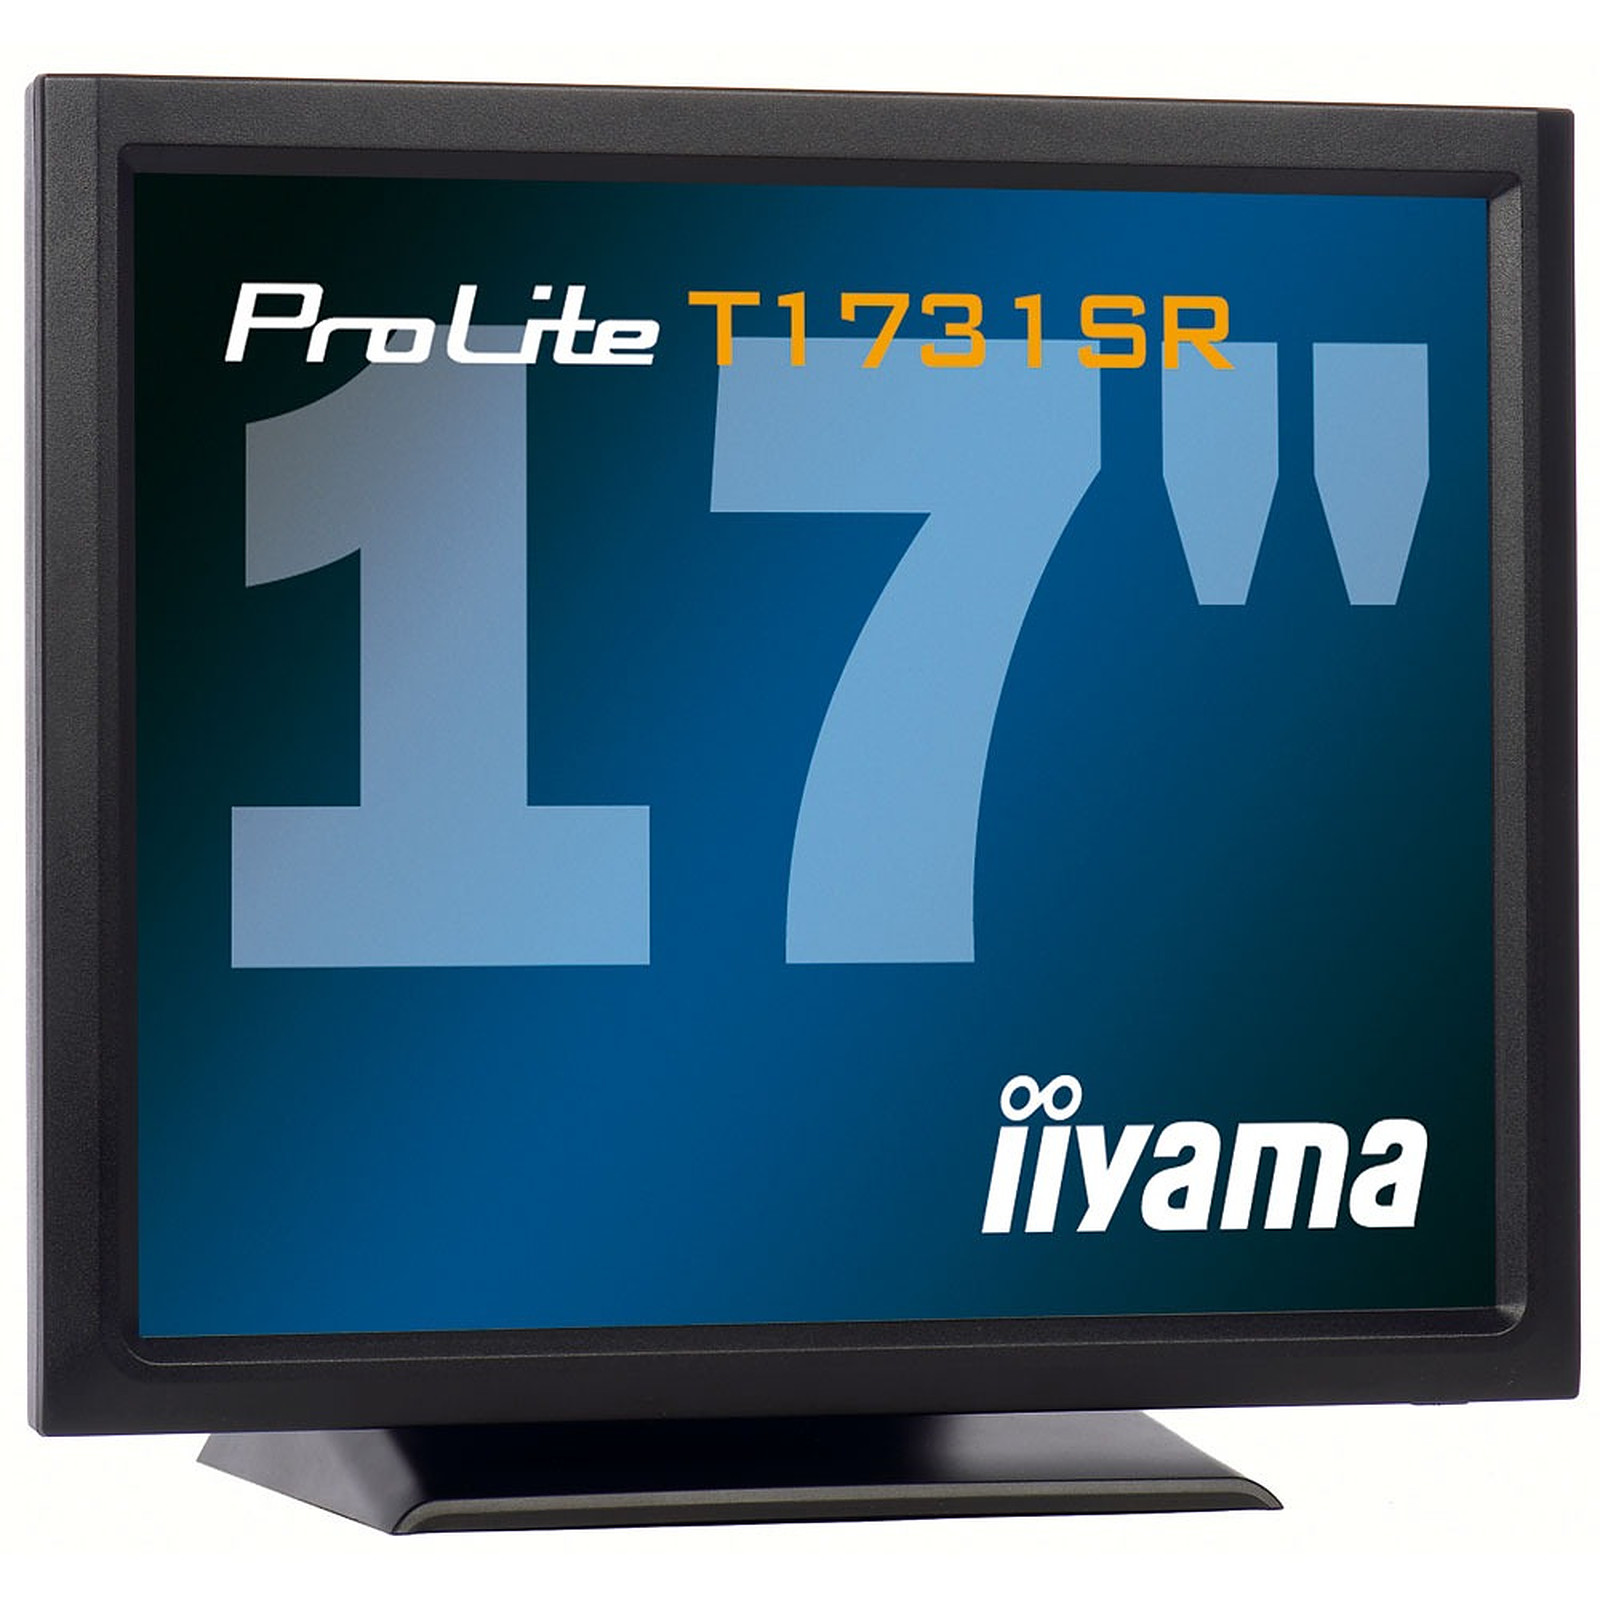 "iiyama 17"" Touch LCD - ProLite T1731SR-1"